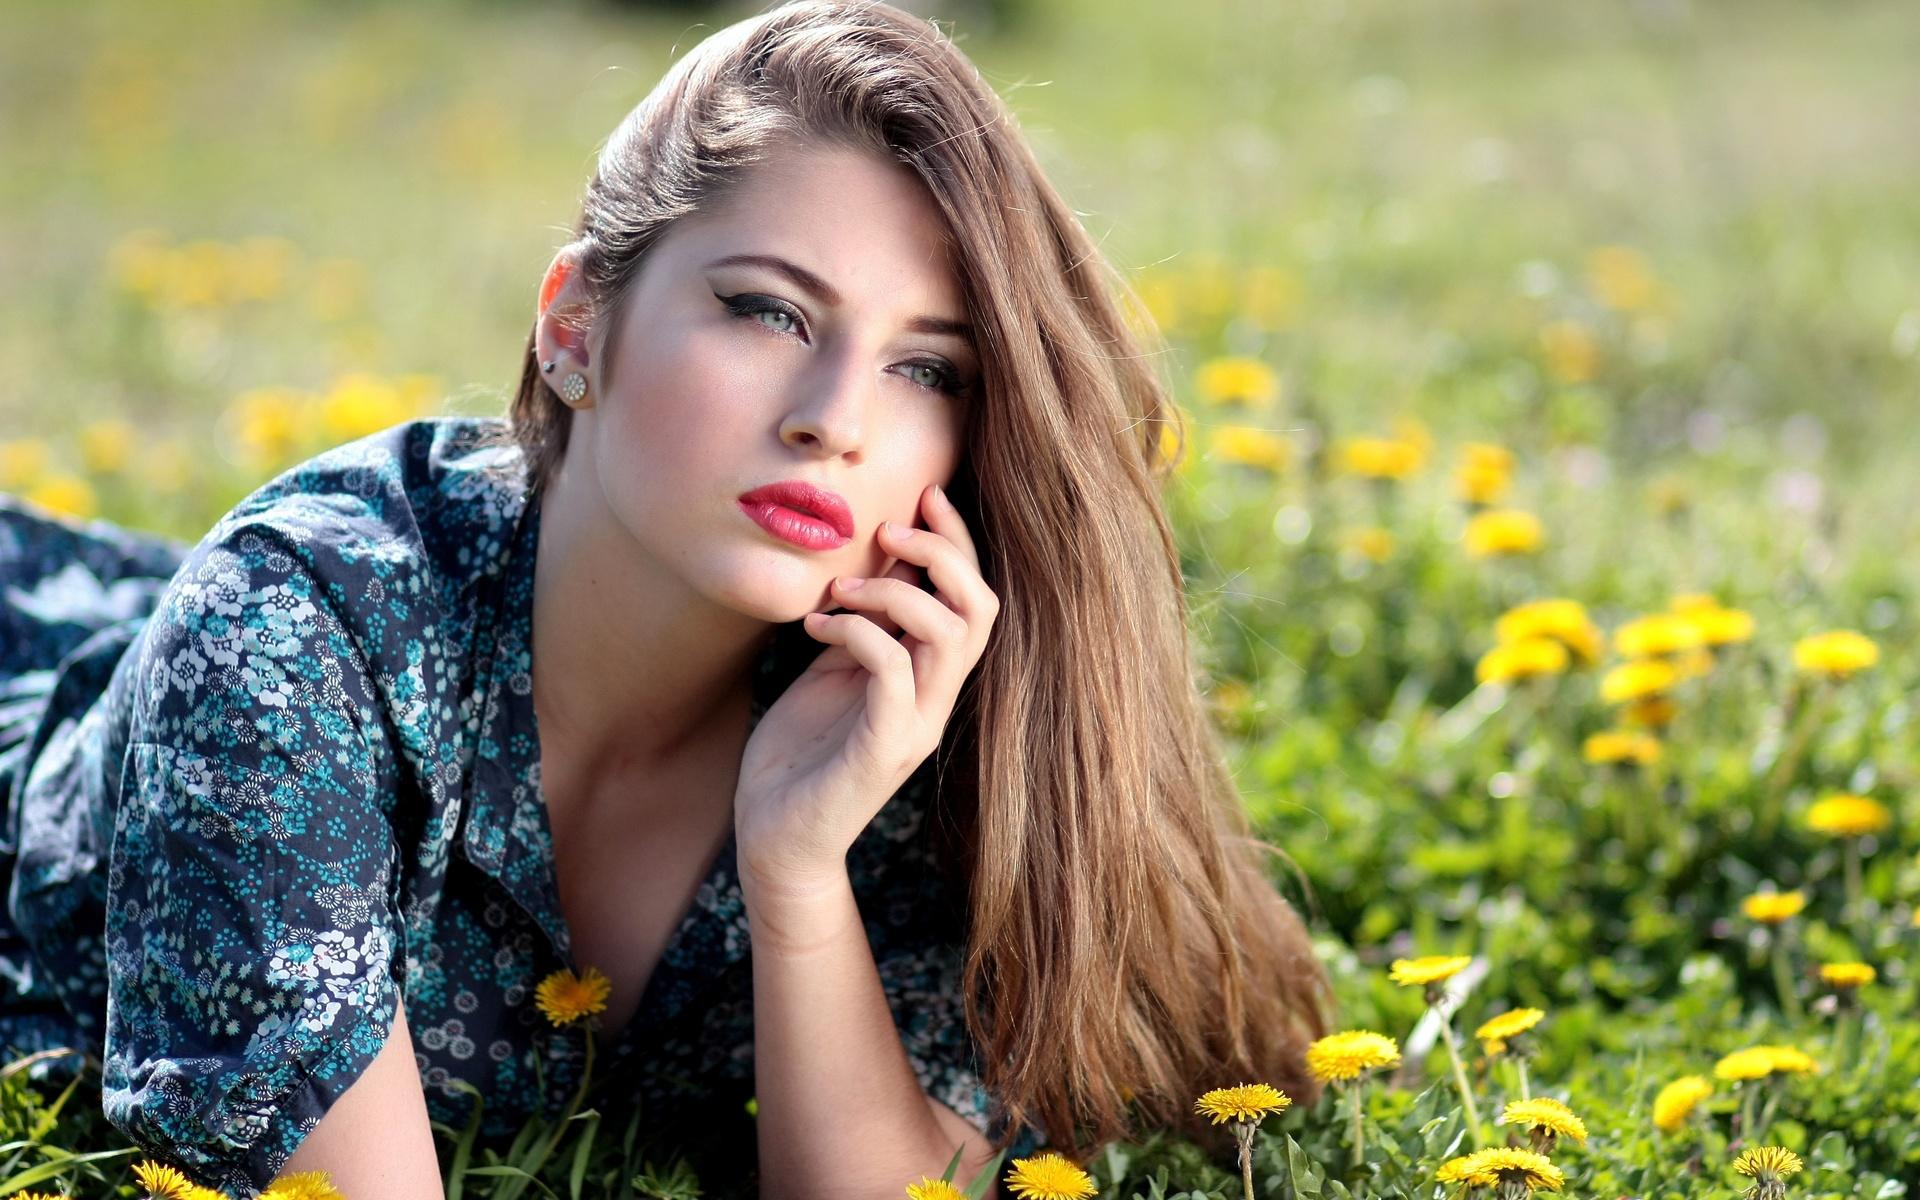 Картинка девочка красота